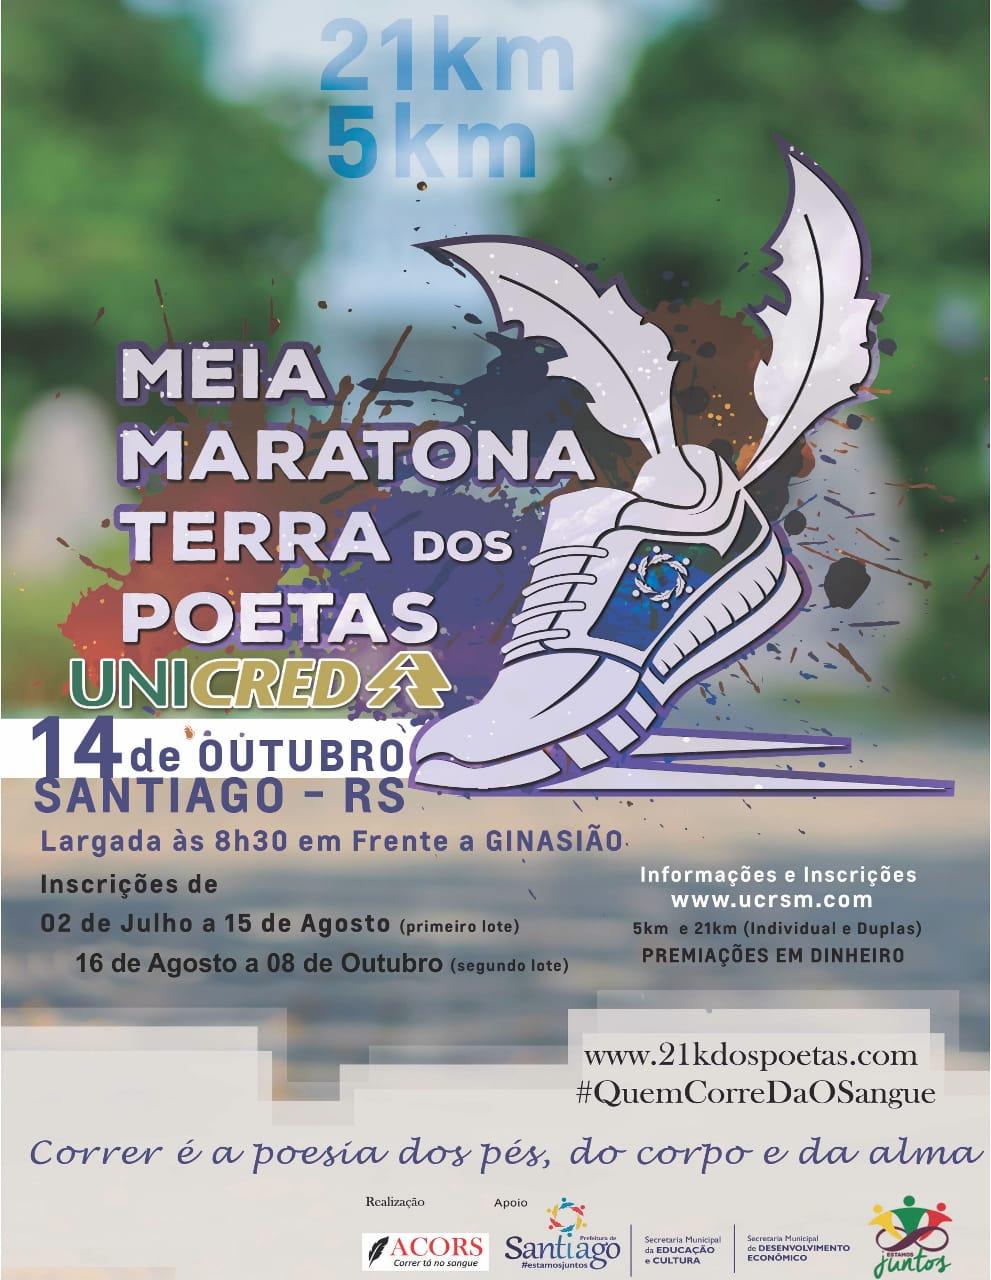 Meia Maratona Terra dos Poetas